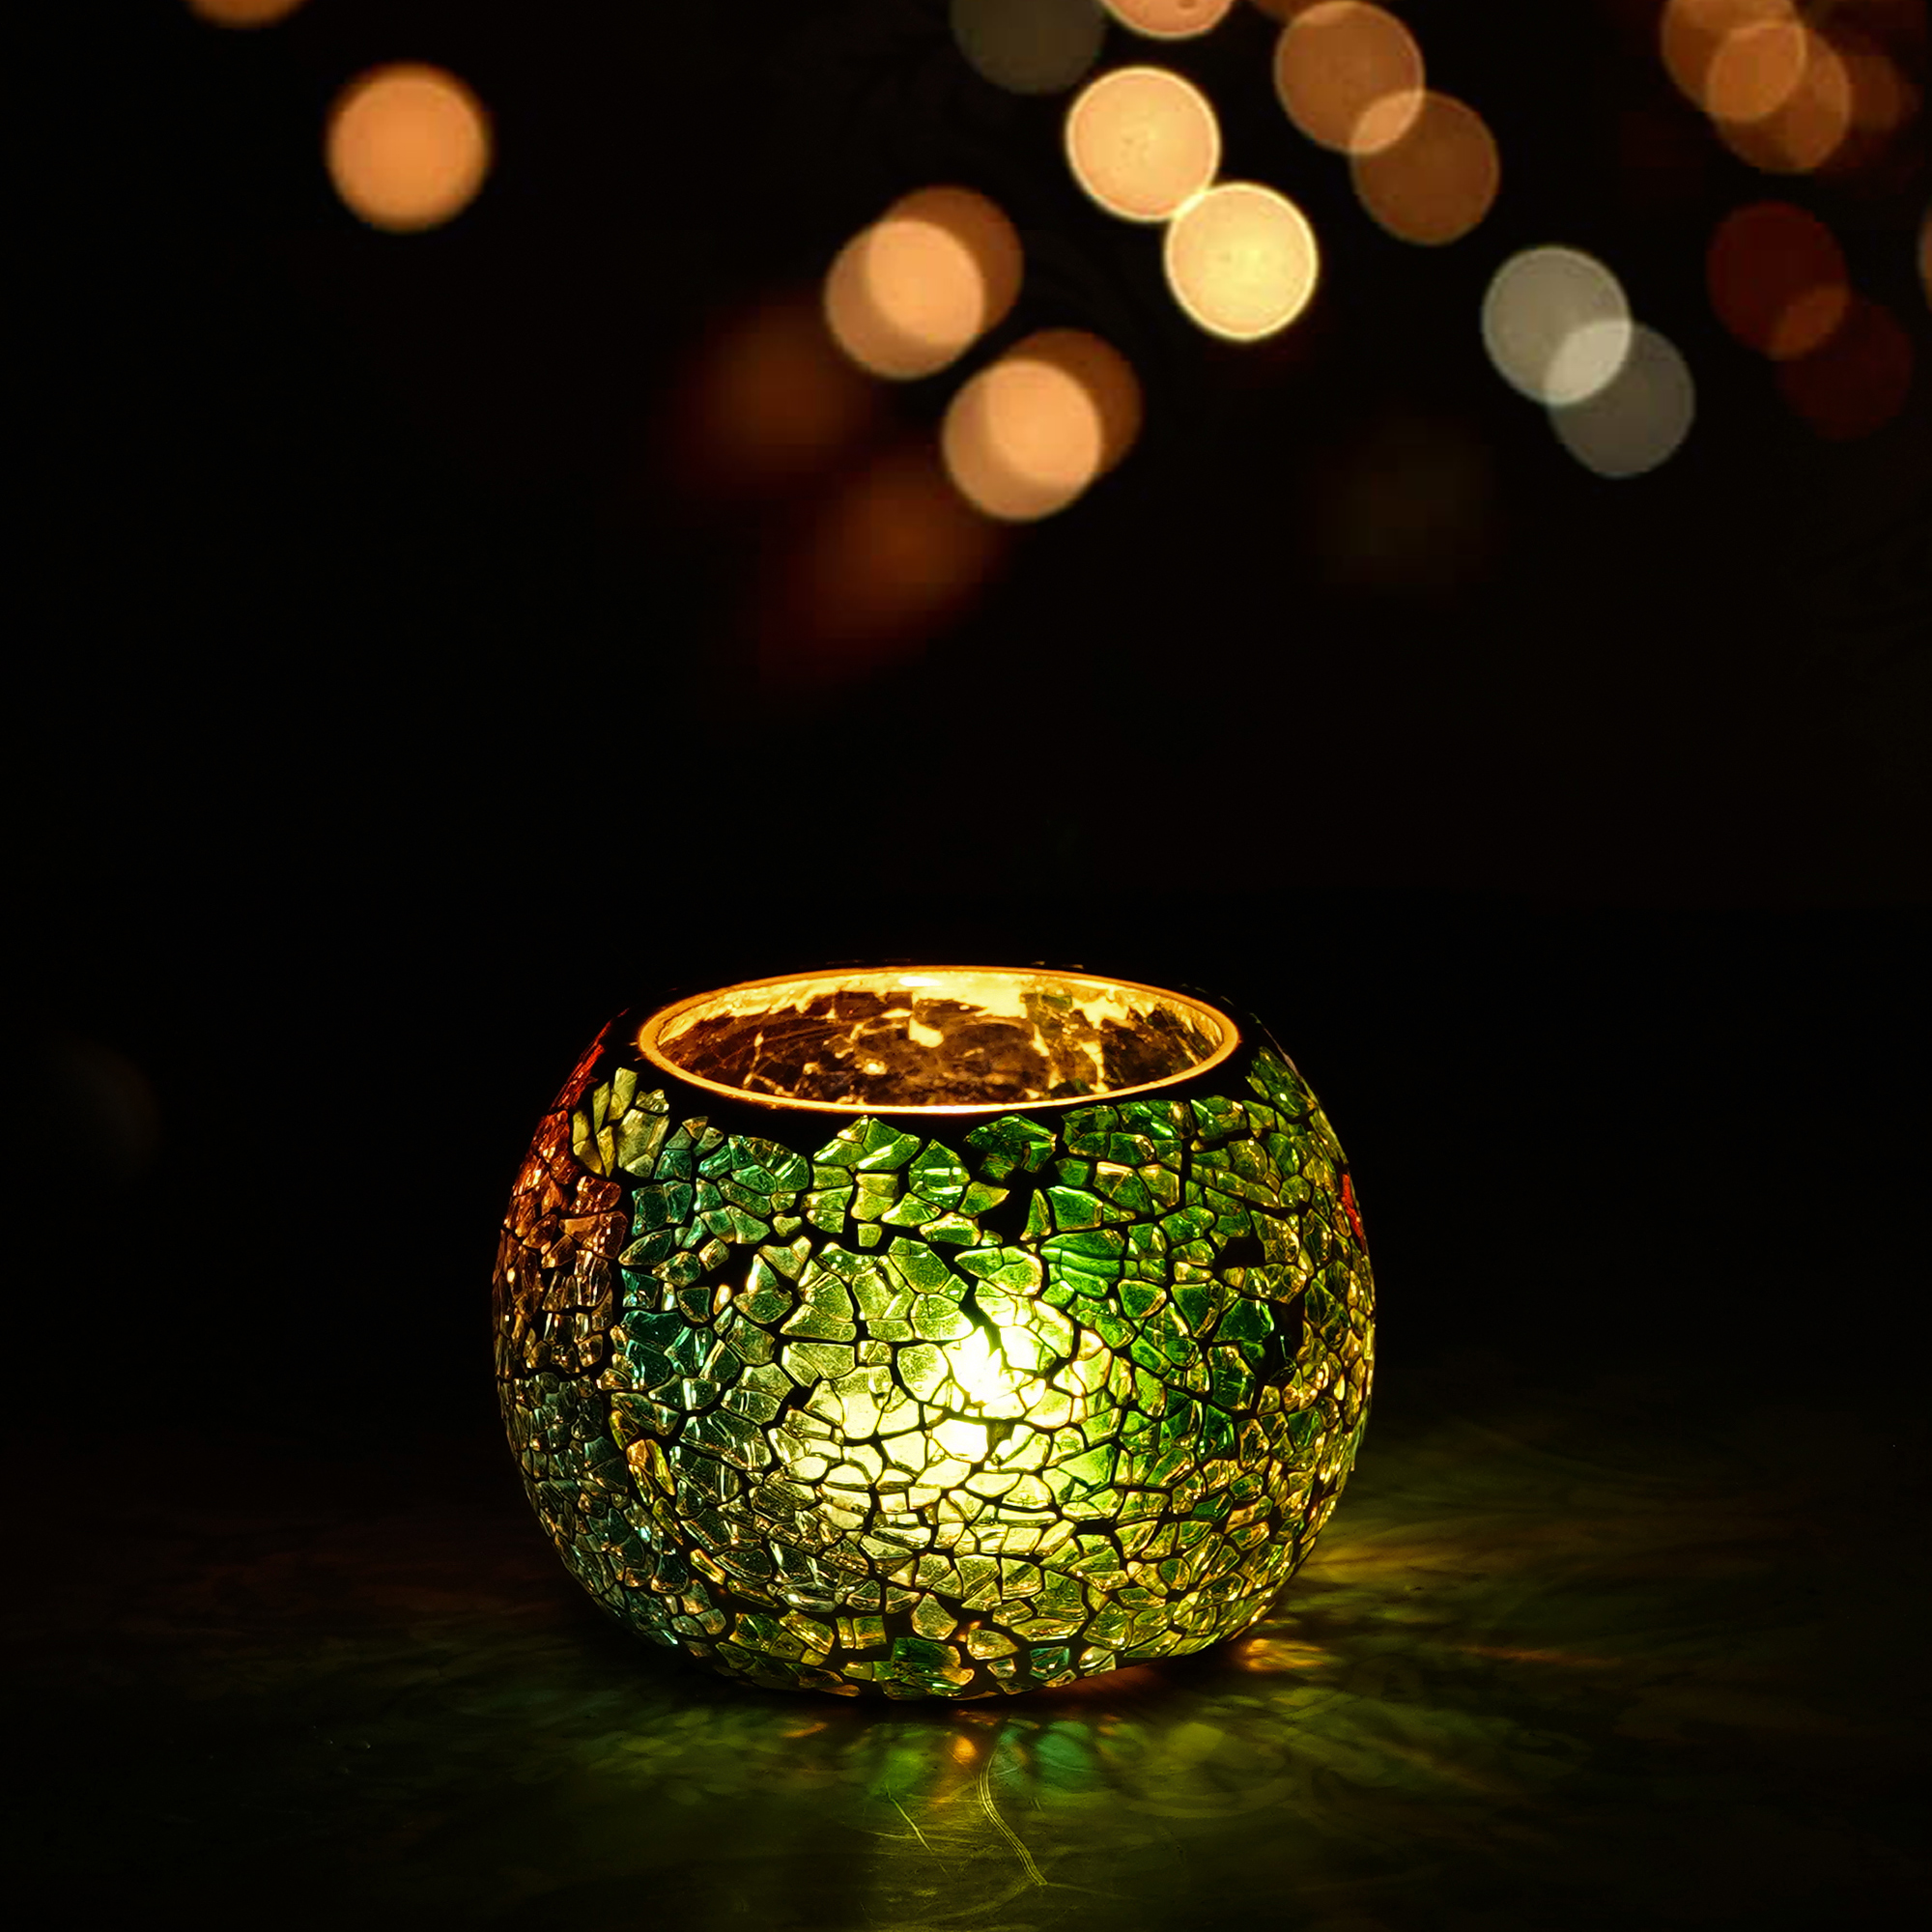 Mosiac Glass Decorative Tea Light Holder/Diya  Indian Home Decor